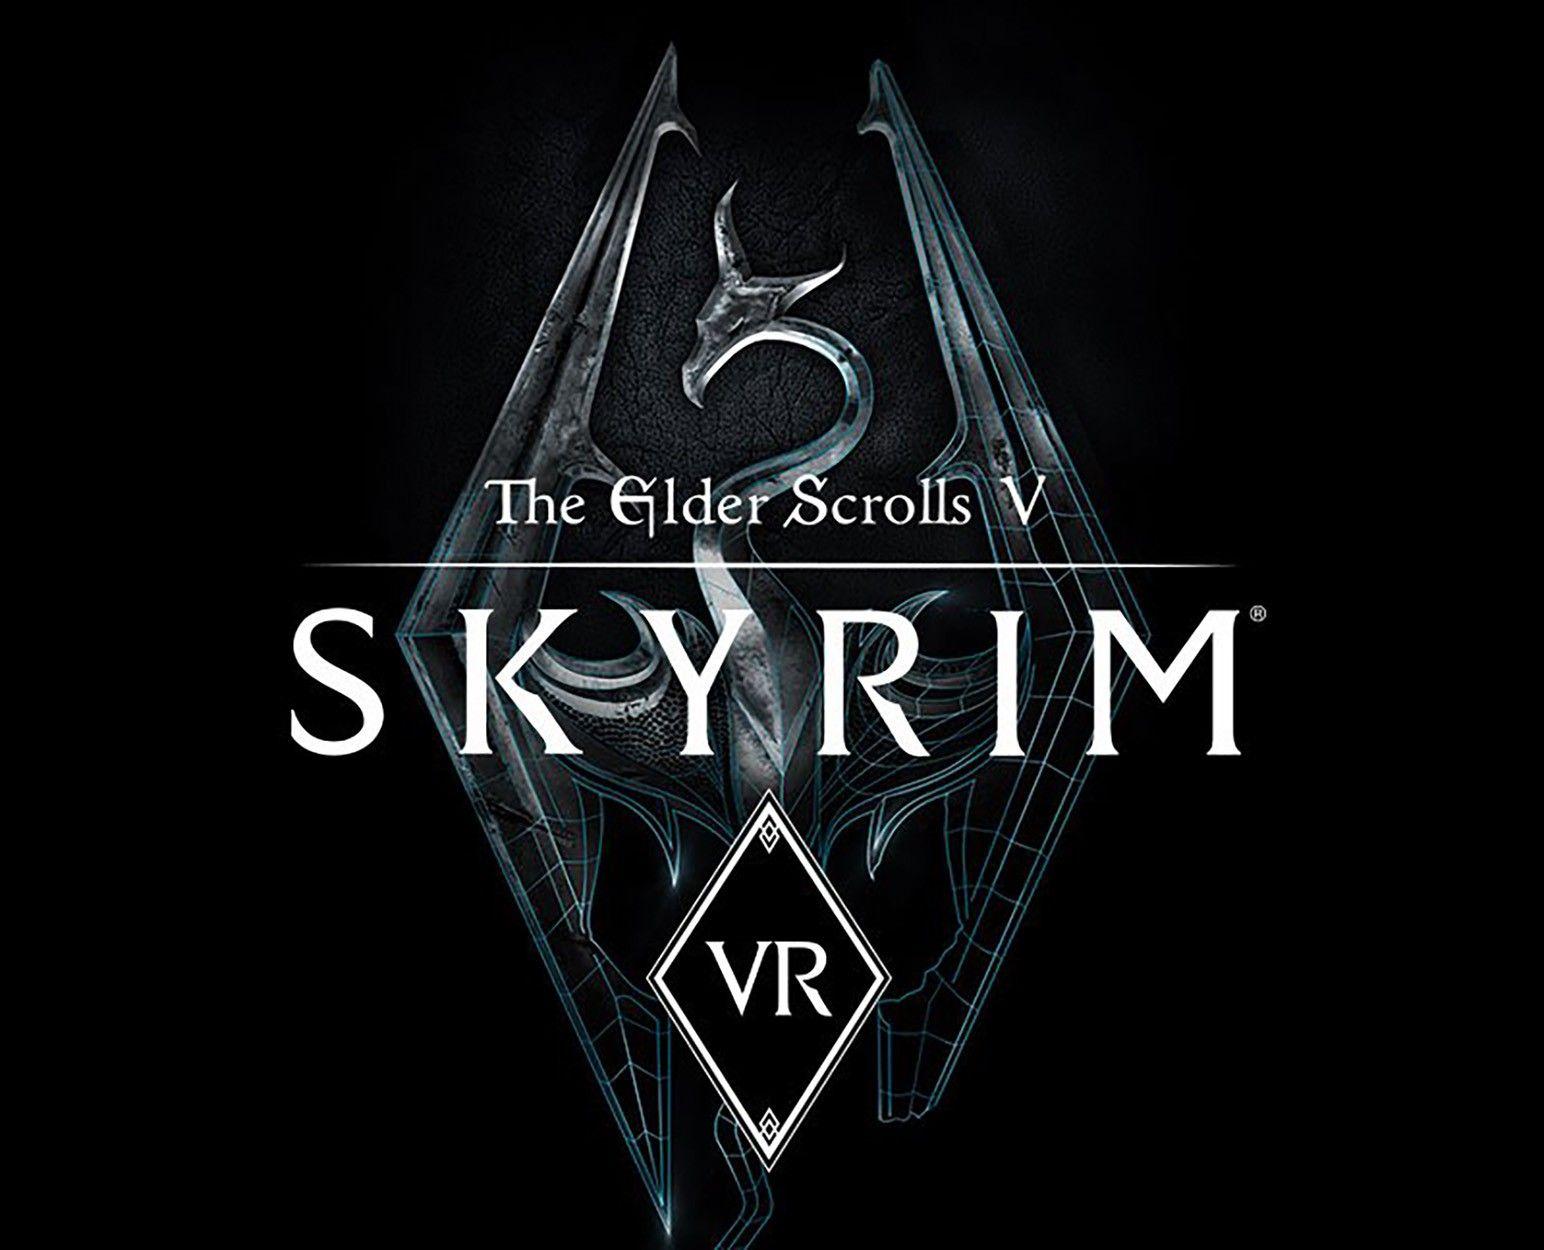 Skyrim vr £34.85 @ Simply games